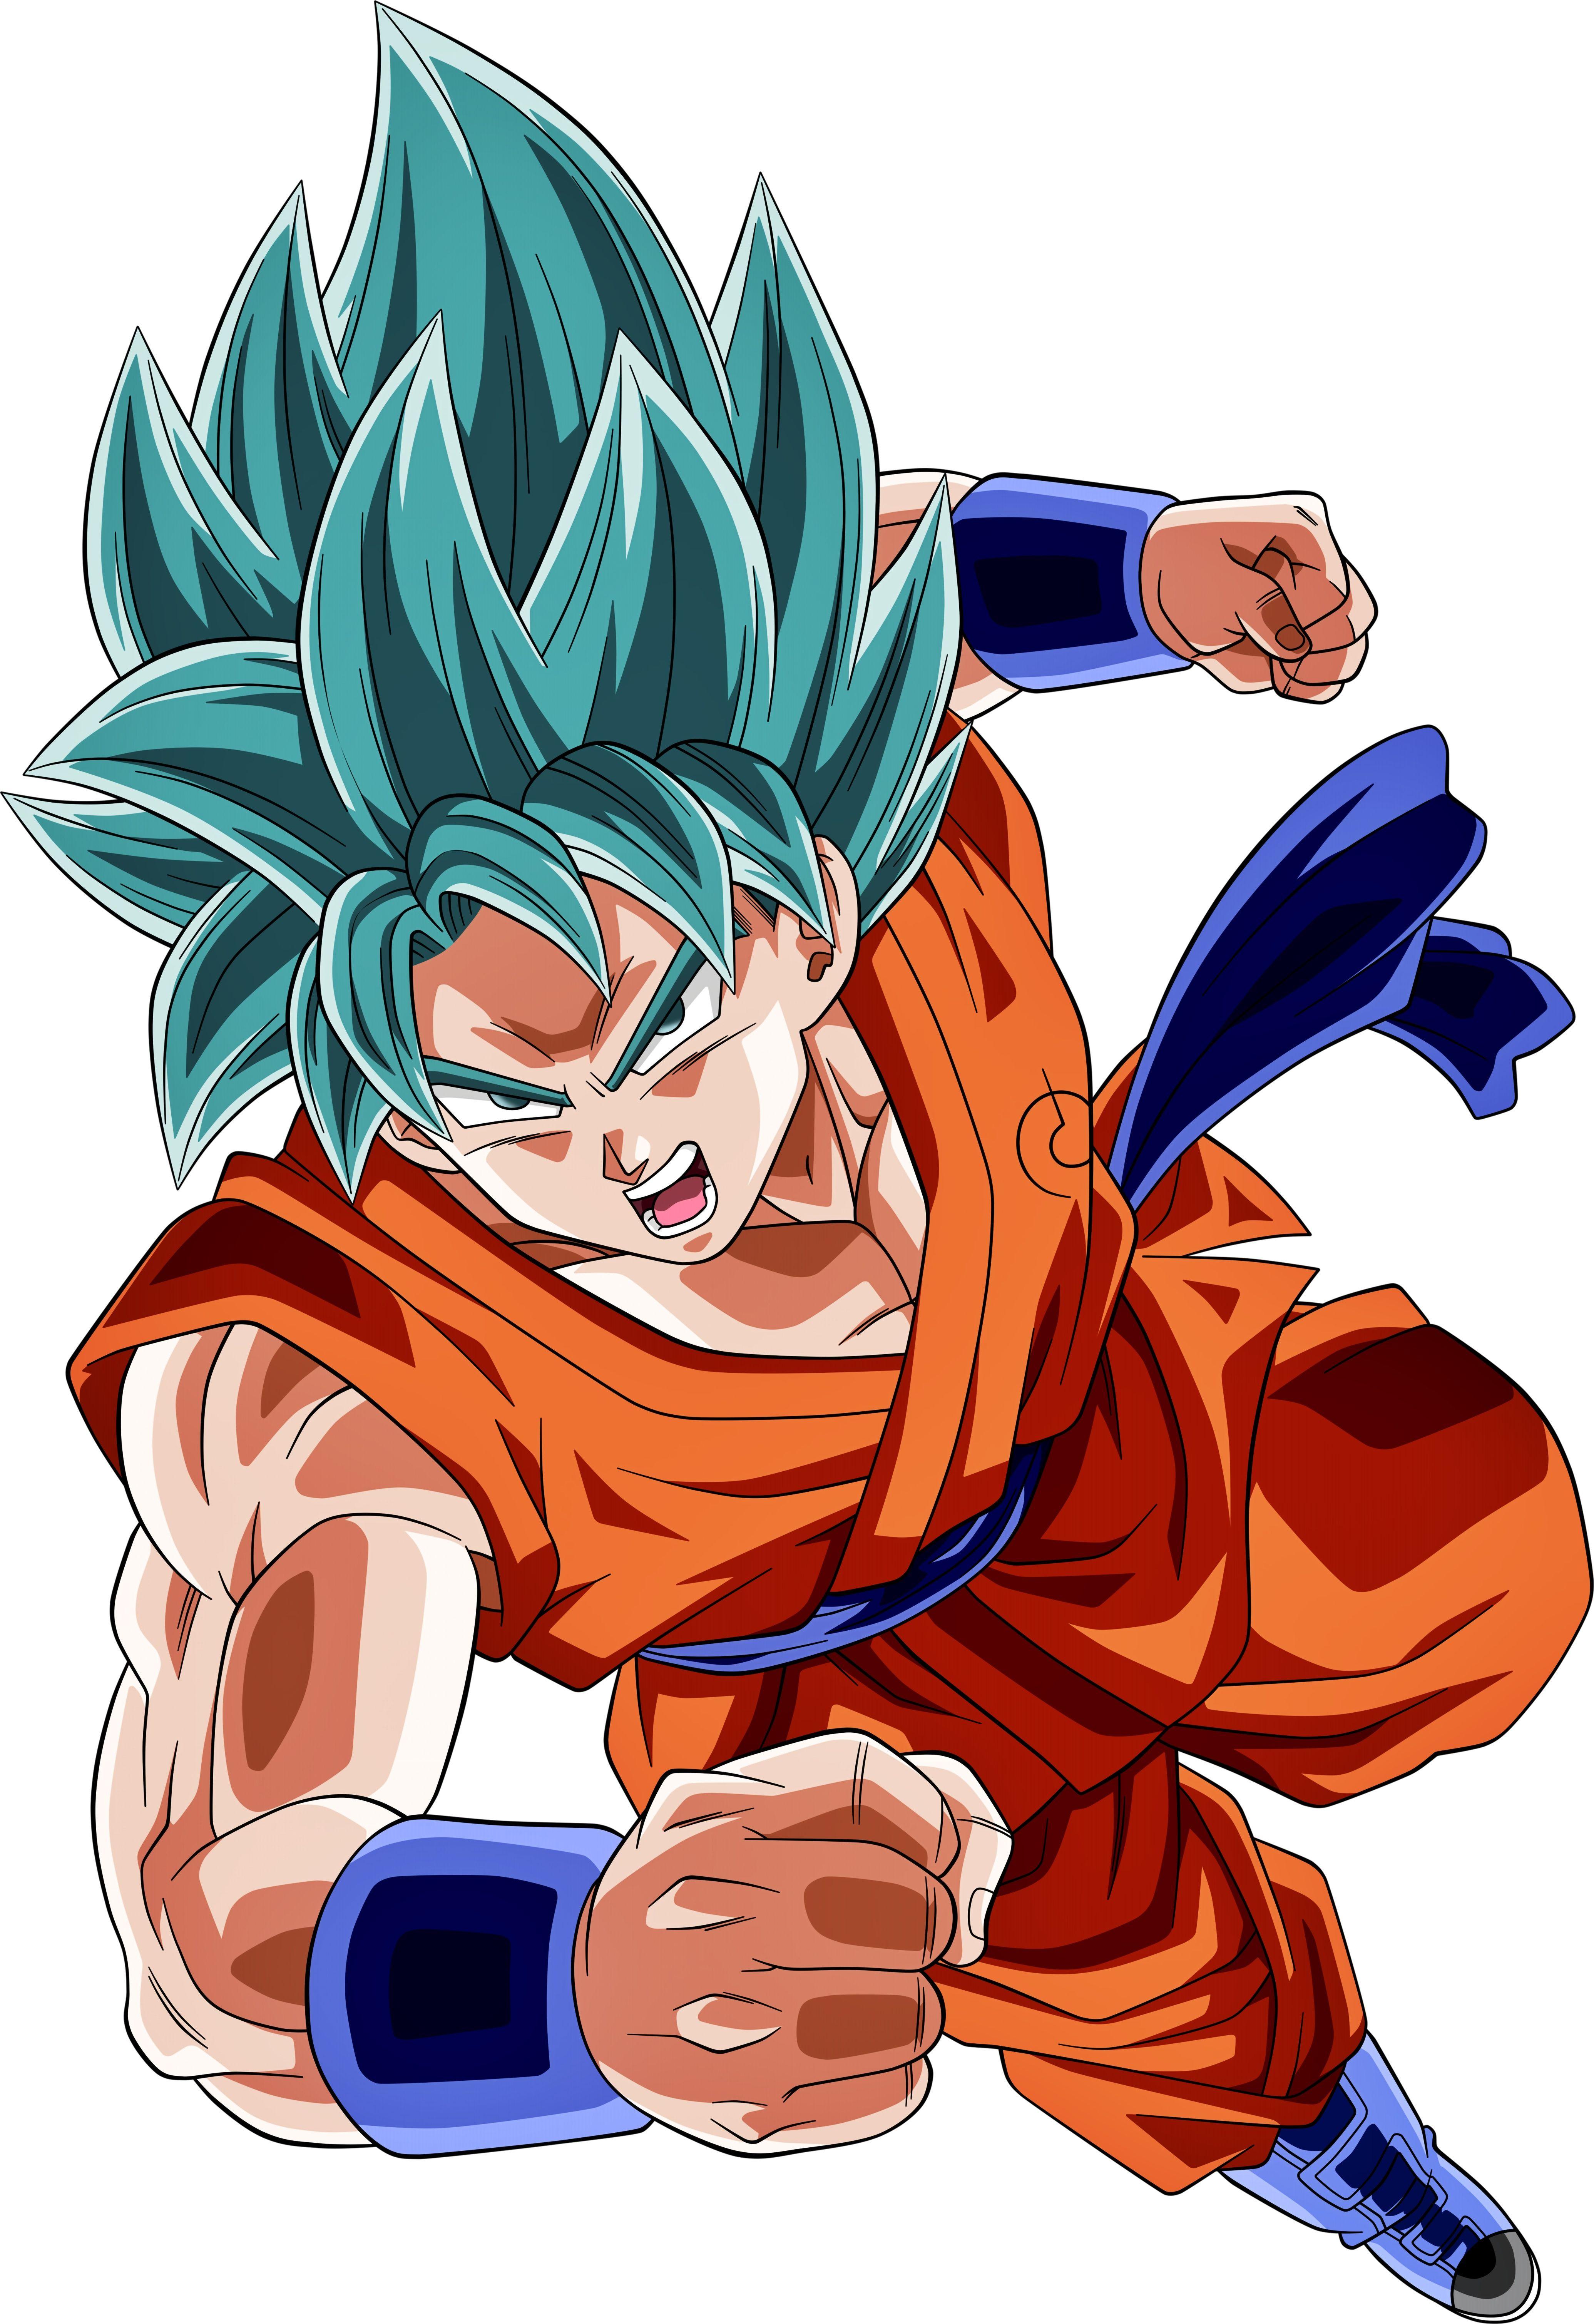 Goku SSJ Blue (Universo 7) Dragon ball super wallpapers